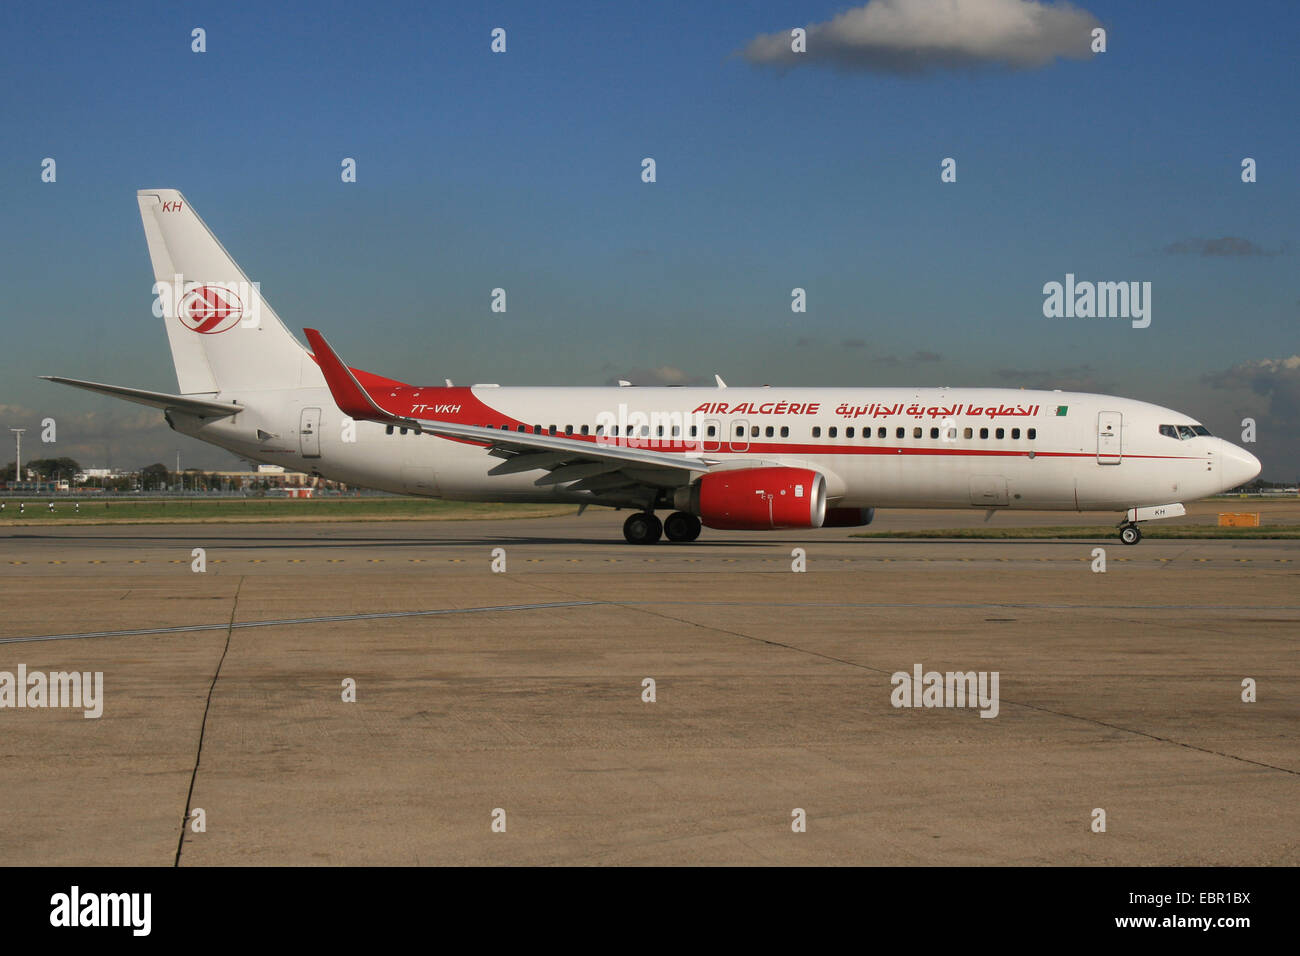 AIR ALGERIE Argelia 737 800 Imagen De Stock